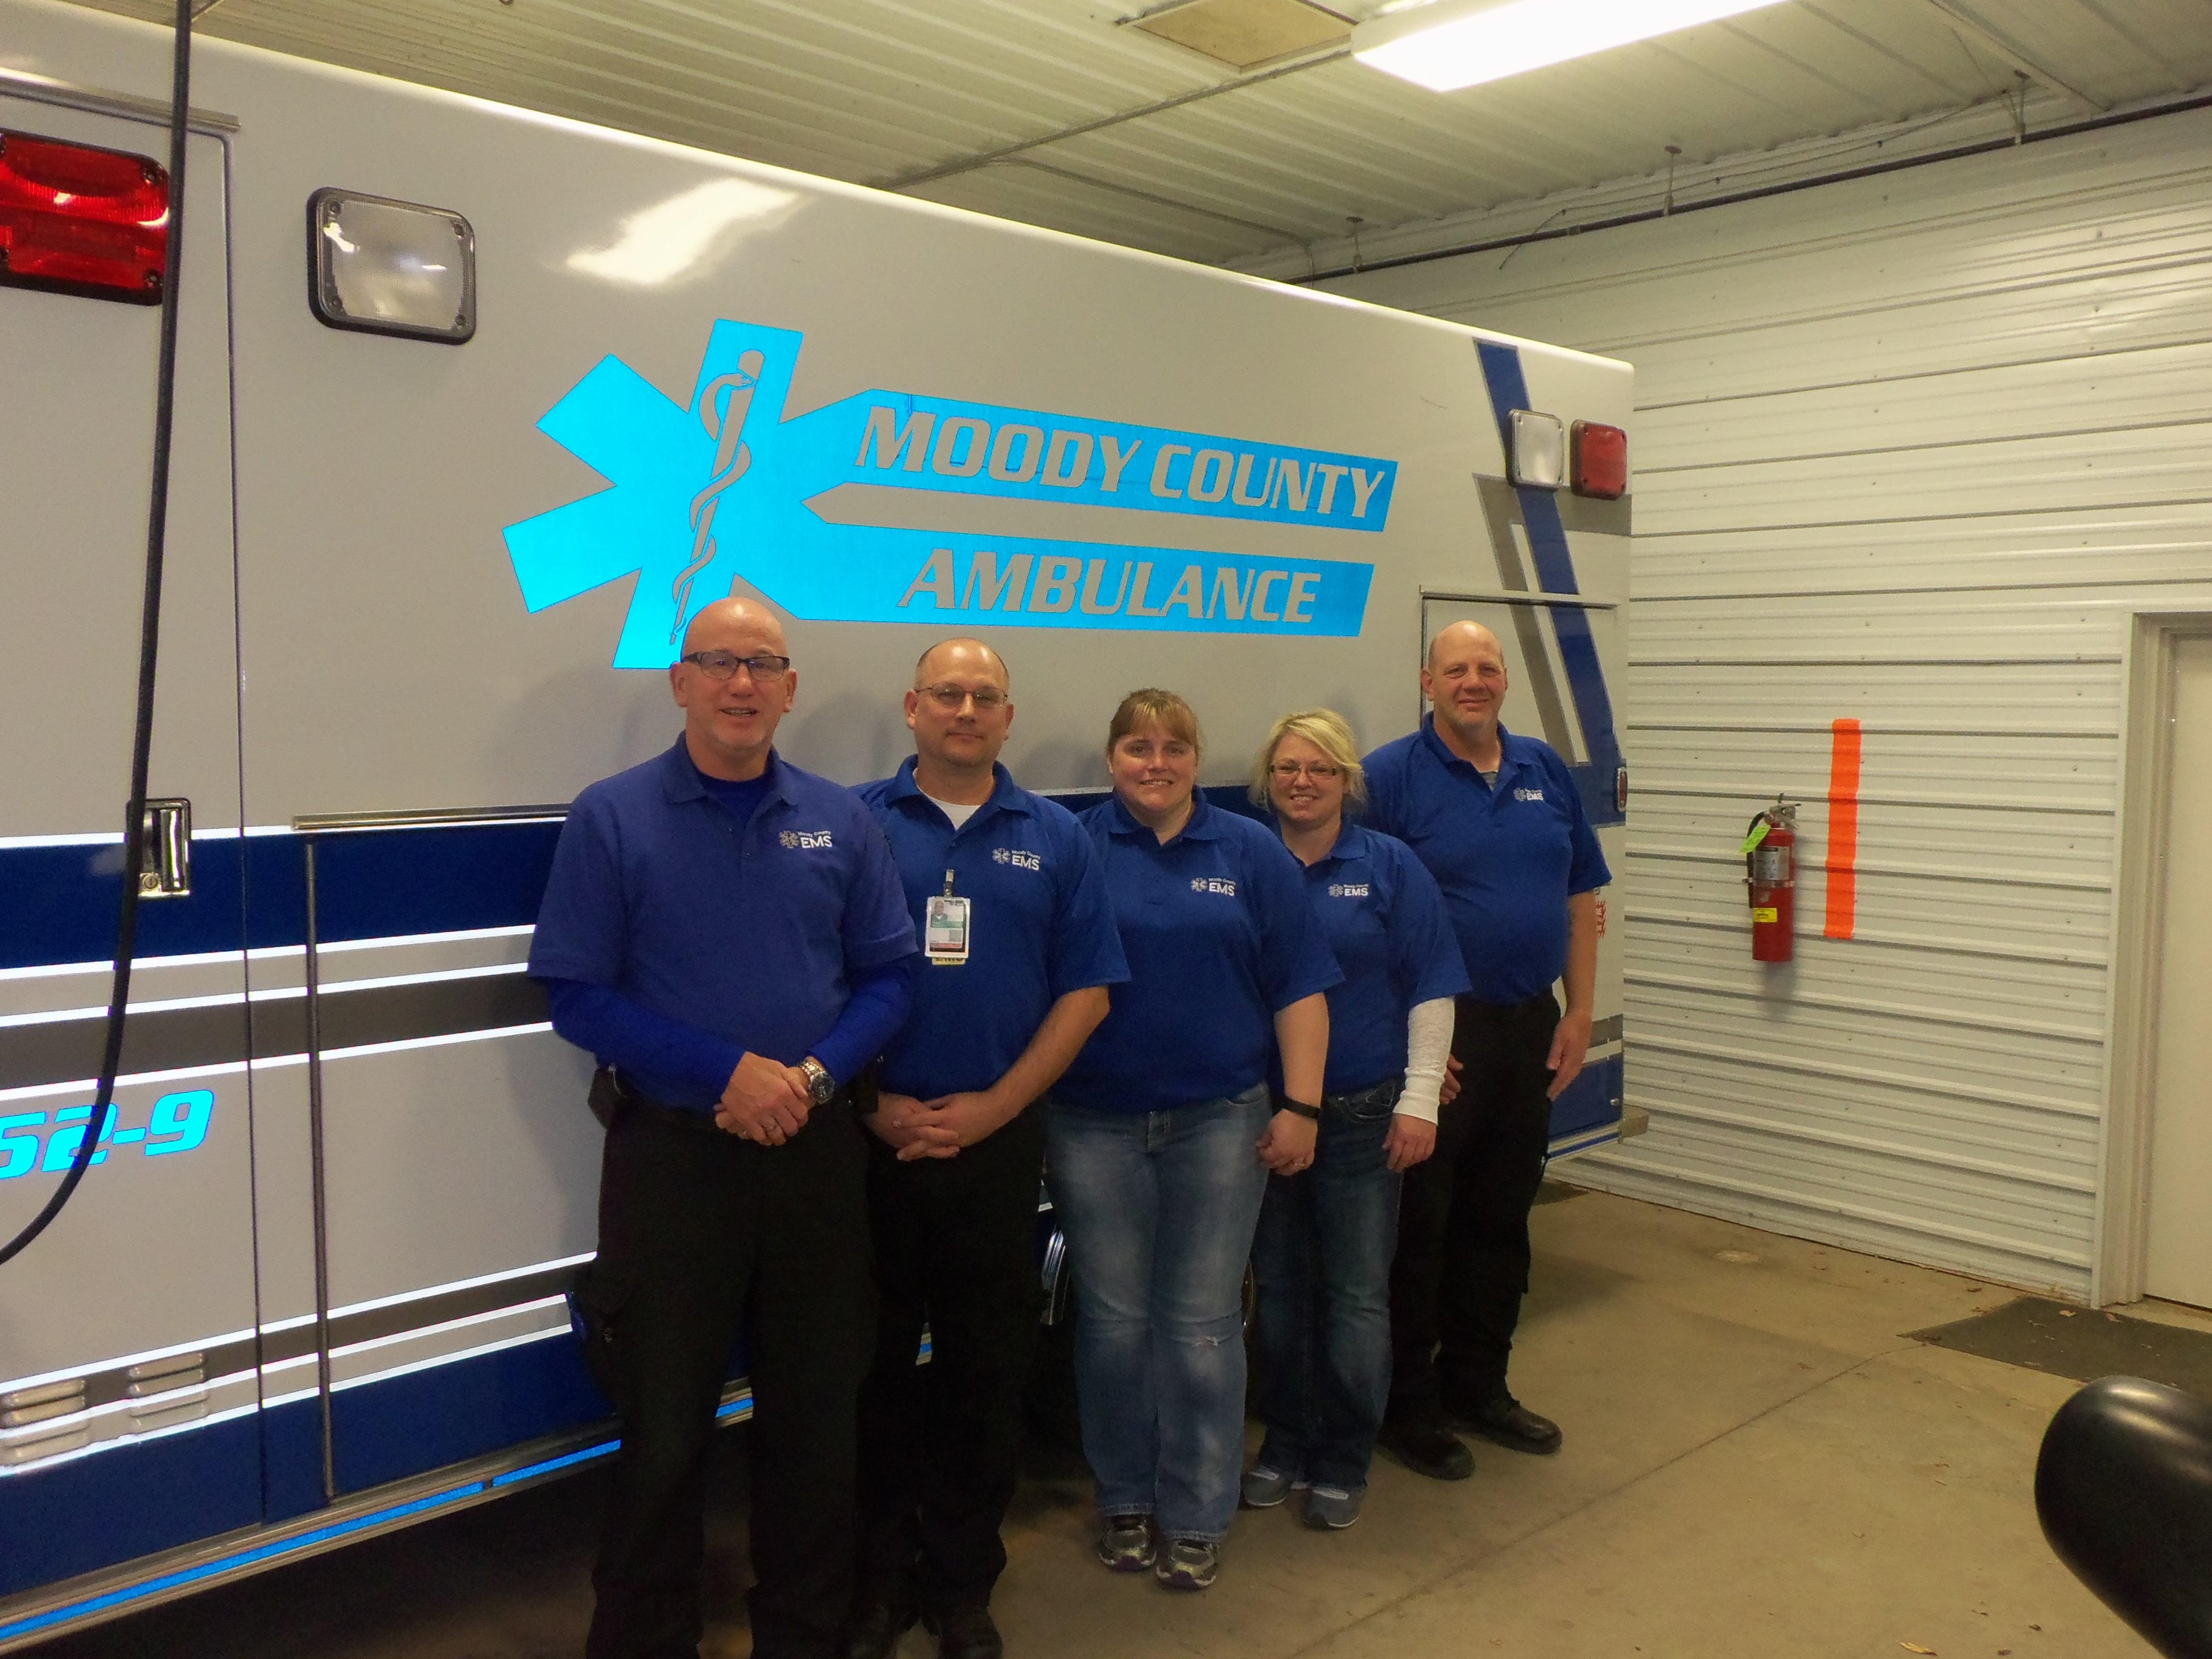 Ambulance Group Picture